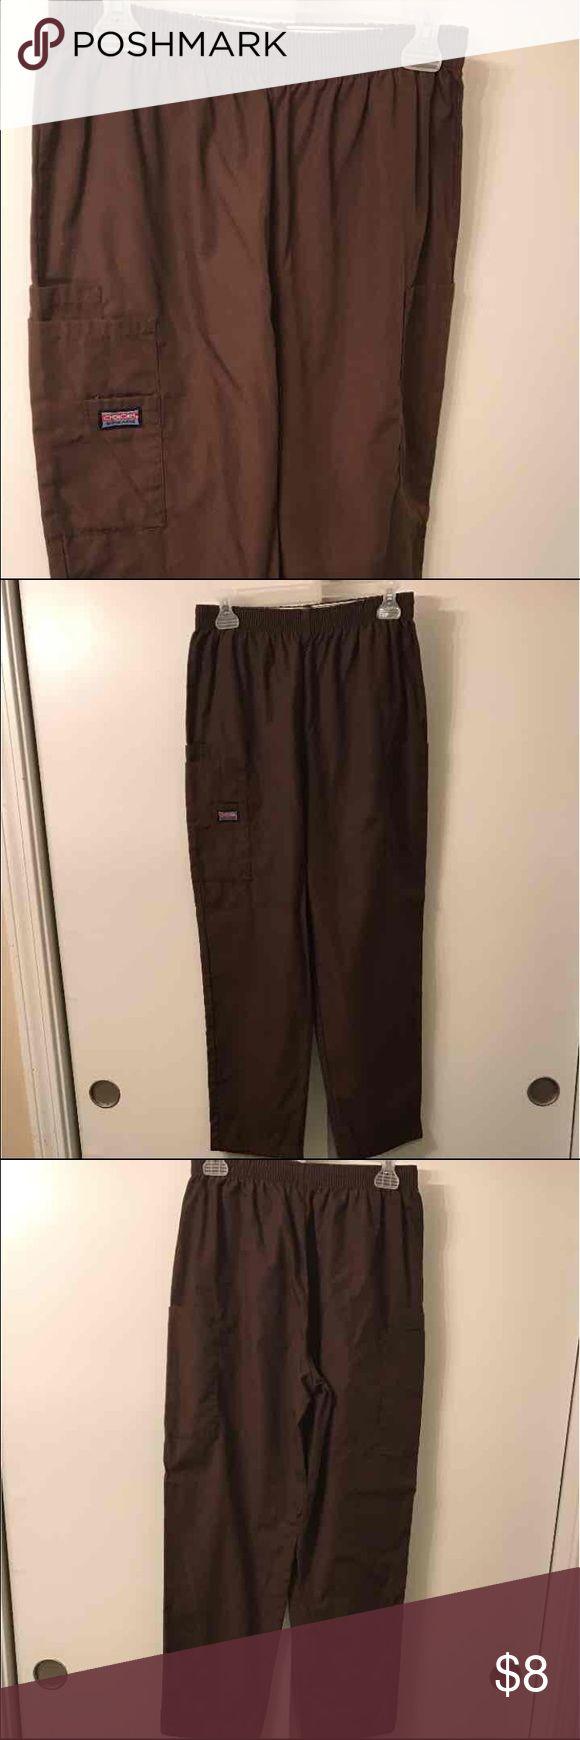 Cherokee Scrub Pants Brand new! Size small, brown Cherokee brand scrub pants. Cargo style pants with pockets on both pant legs, elastic waistband Cherokee Pants